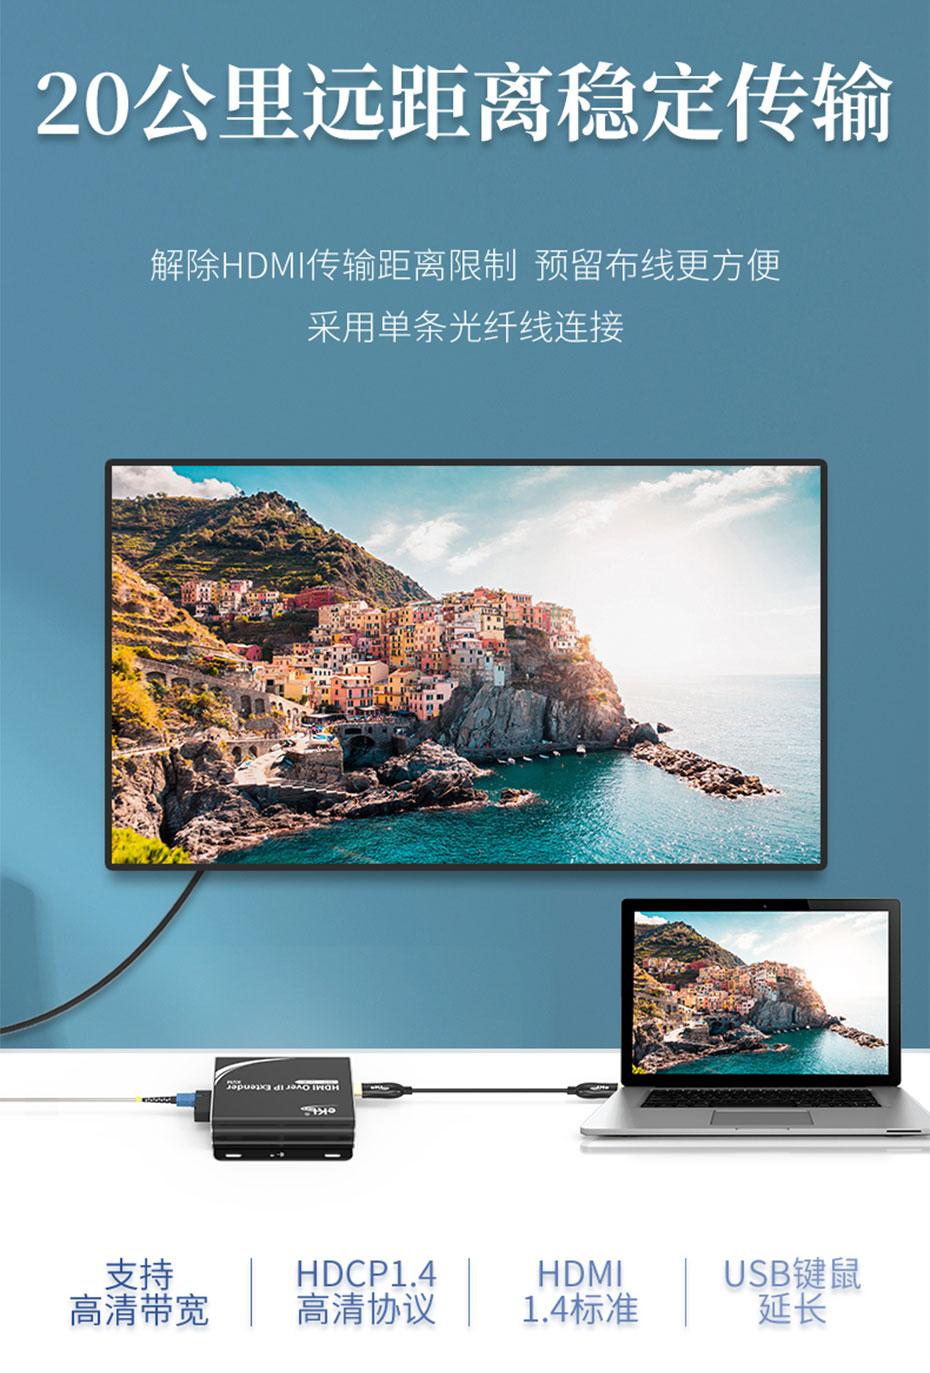 HDMI KVM光纤延长器HE001采用光纤线最远可延长20千米